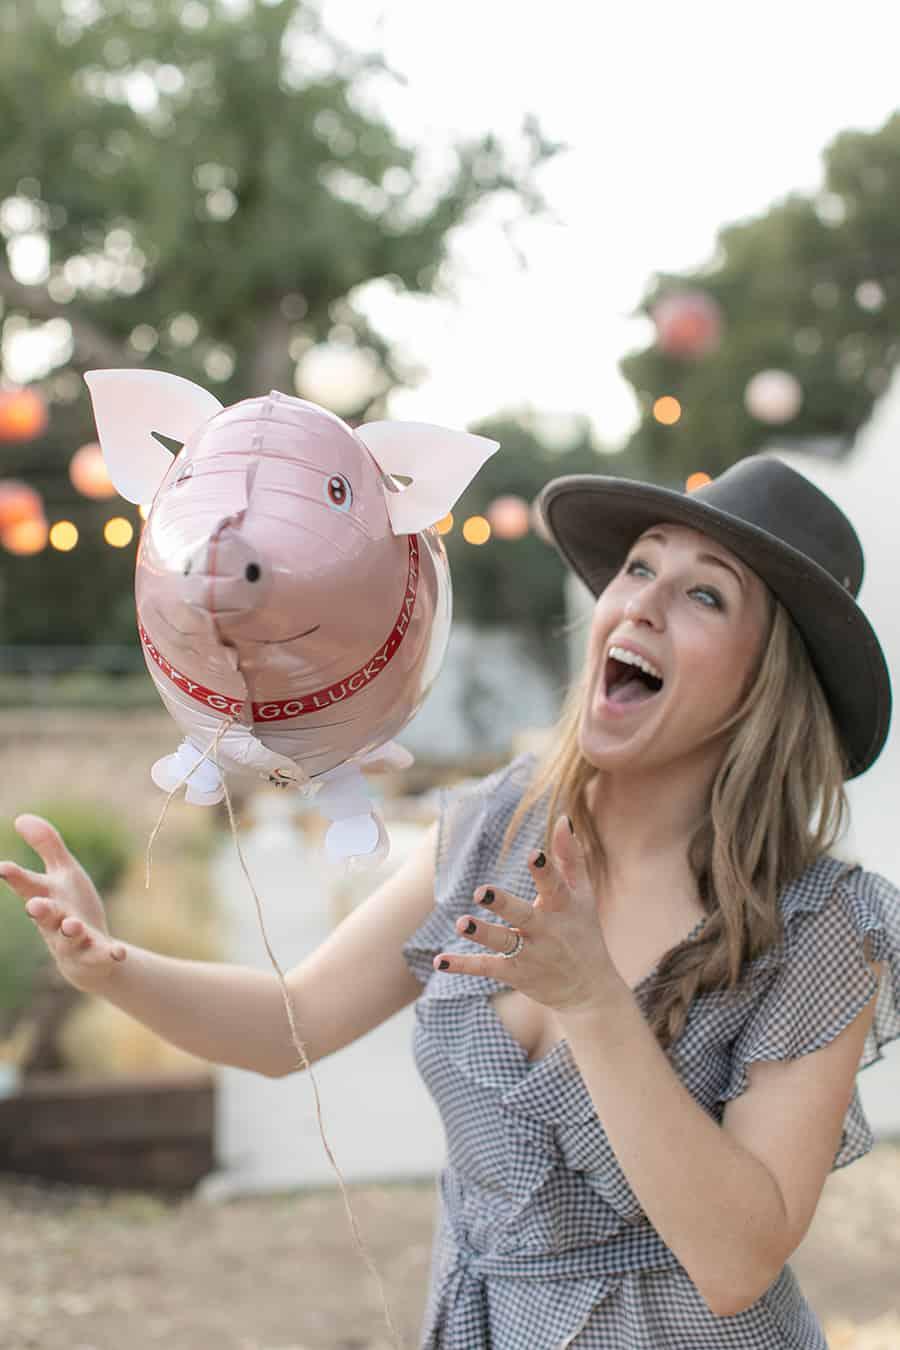 Eden Passante holding pig balloon